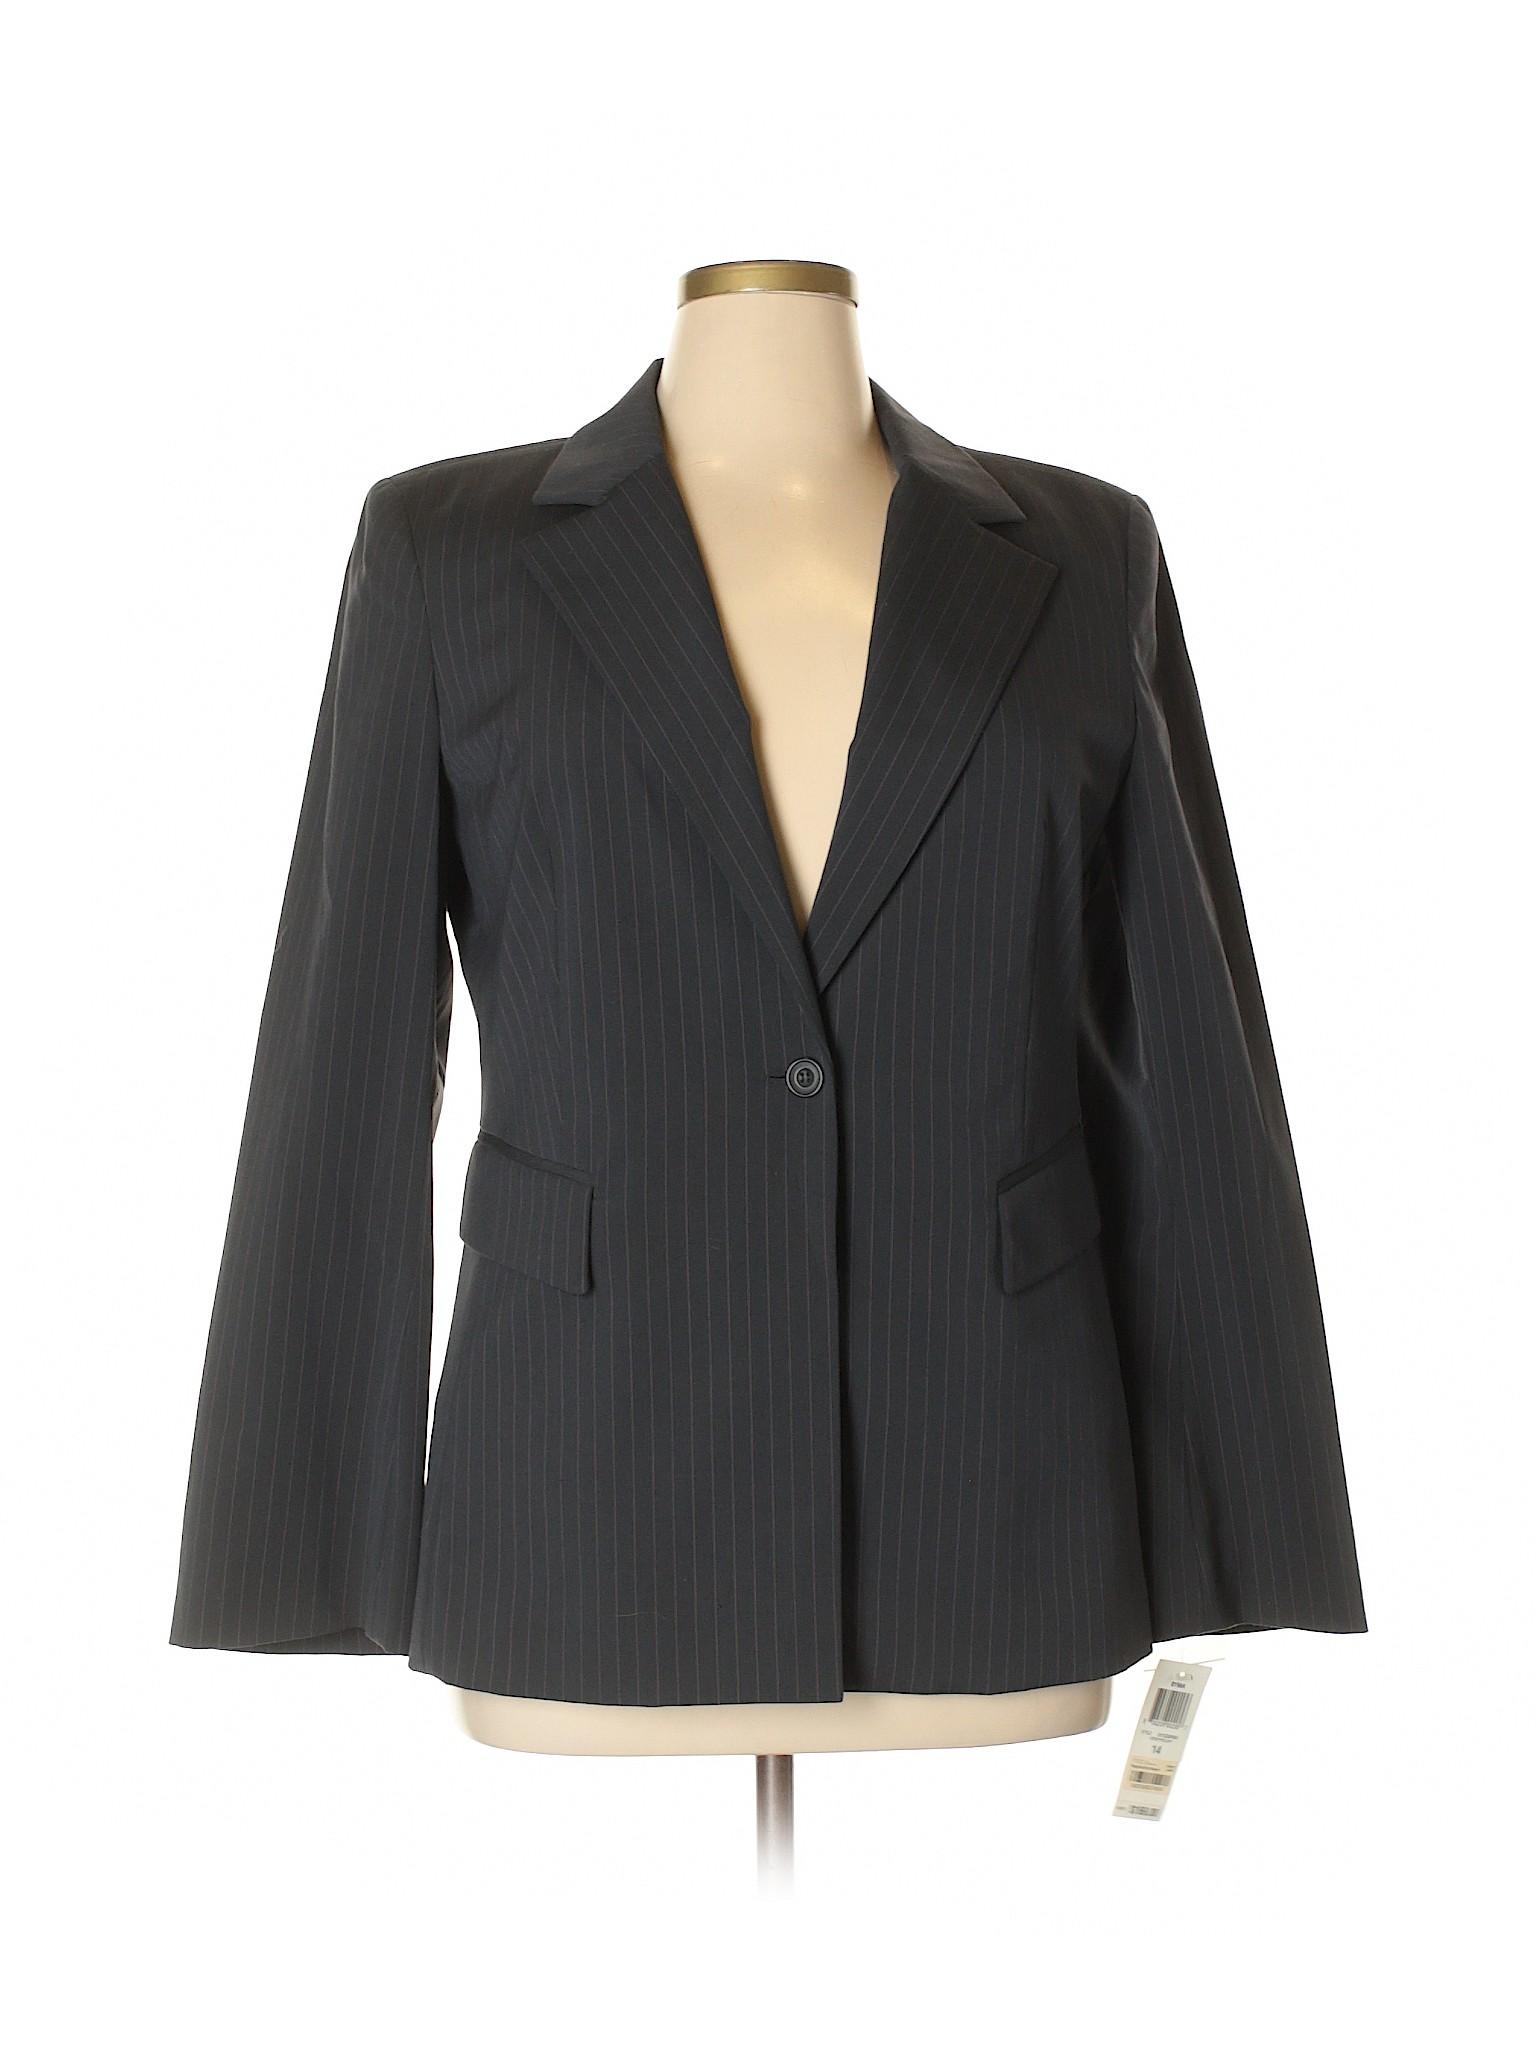 International INC Blazer Boutique Concepts leisure xFw6Uxqf